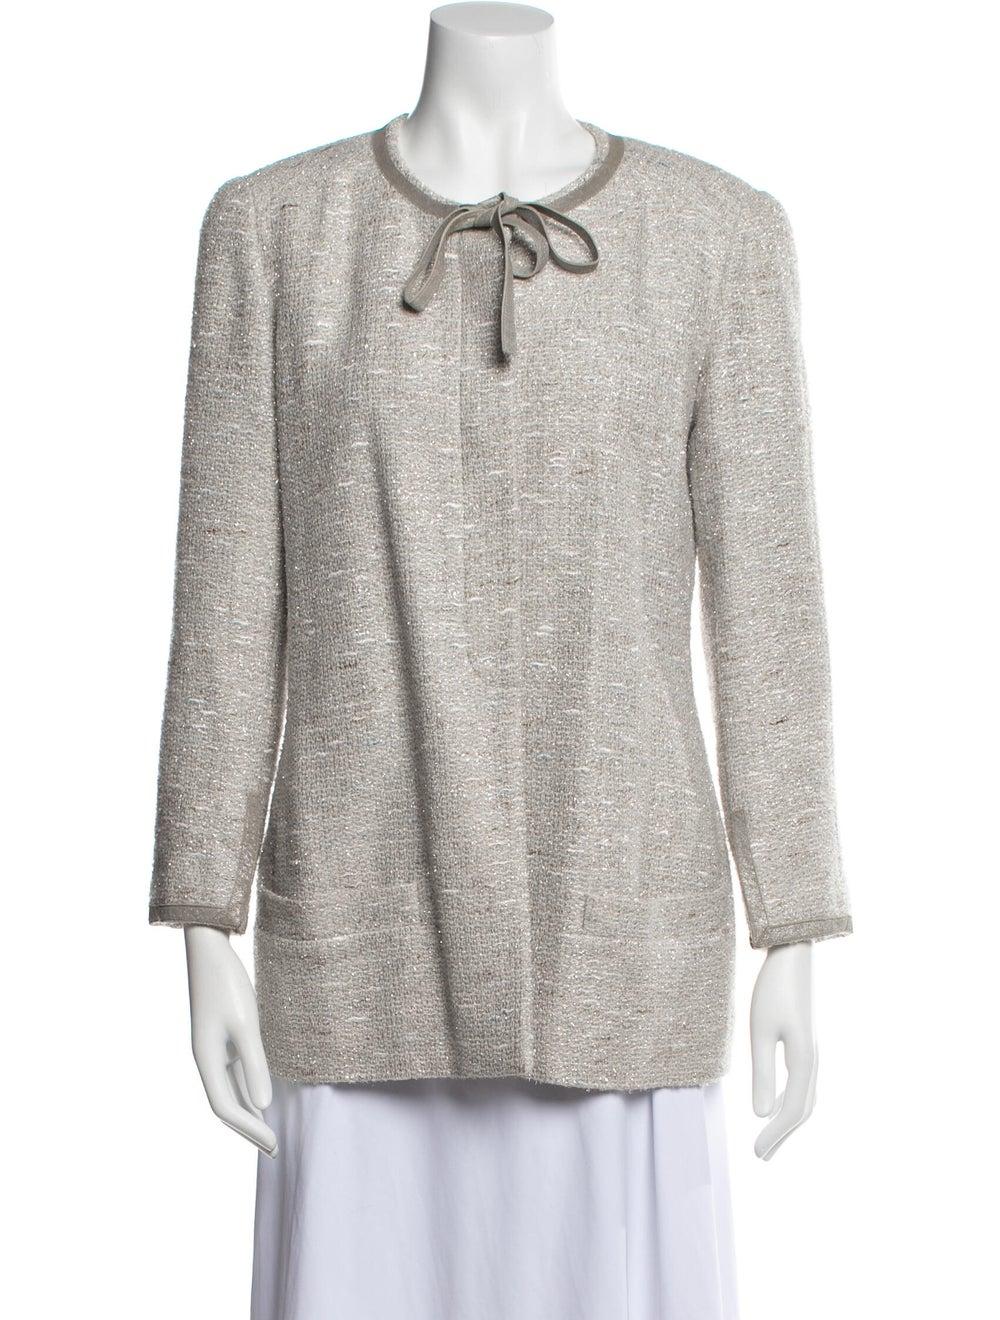 Chanel Vintage 1999 Evening Jacket Grey - image 1